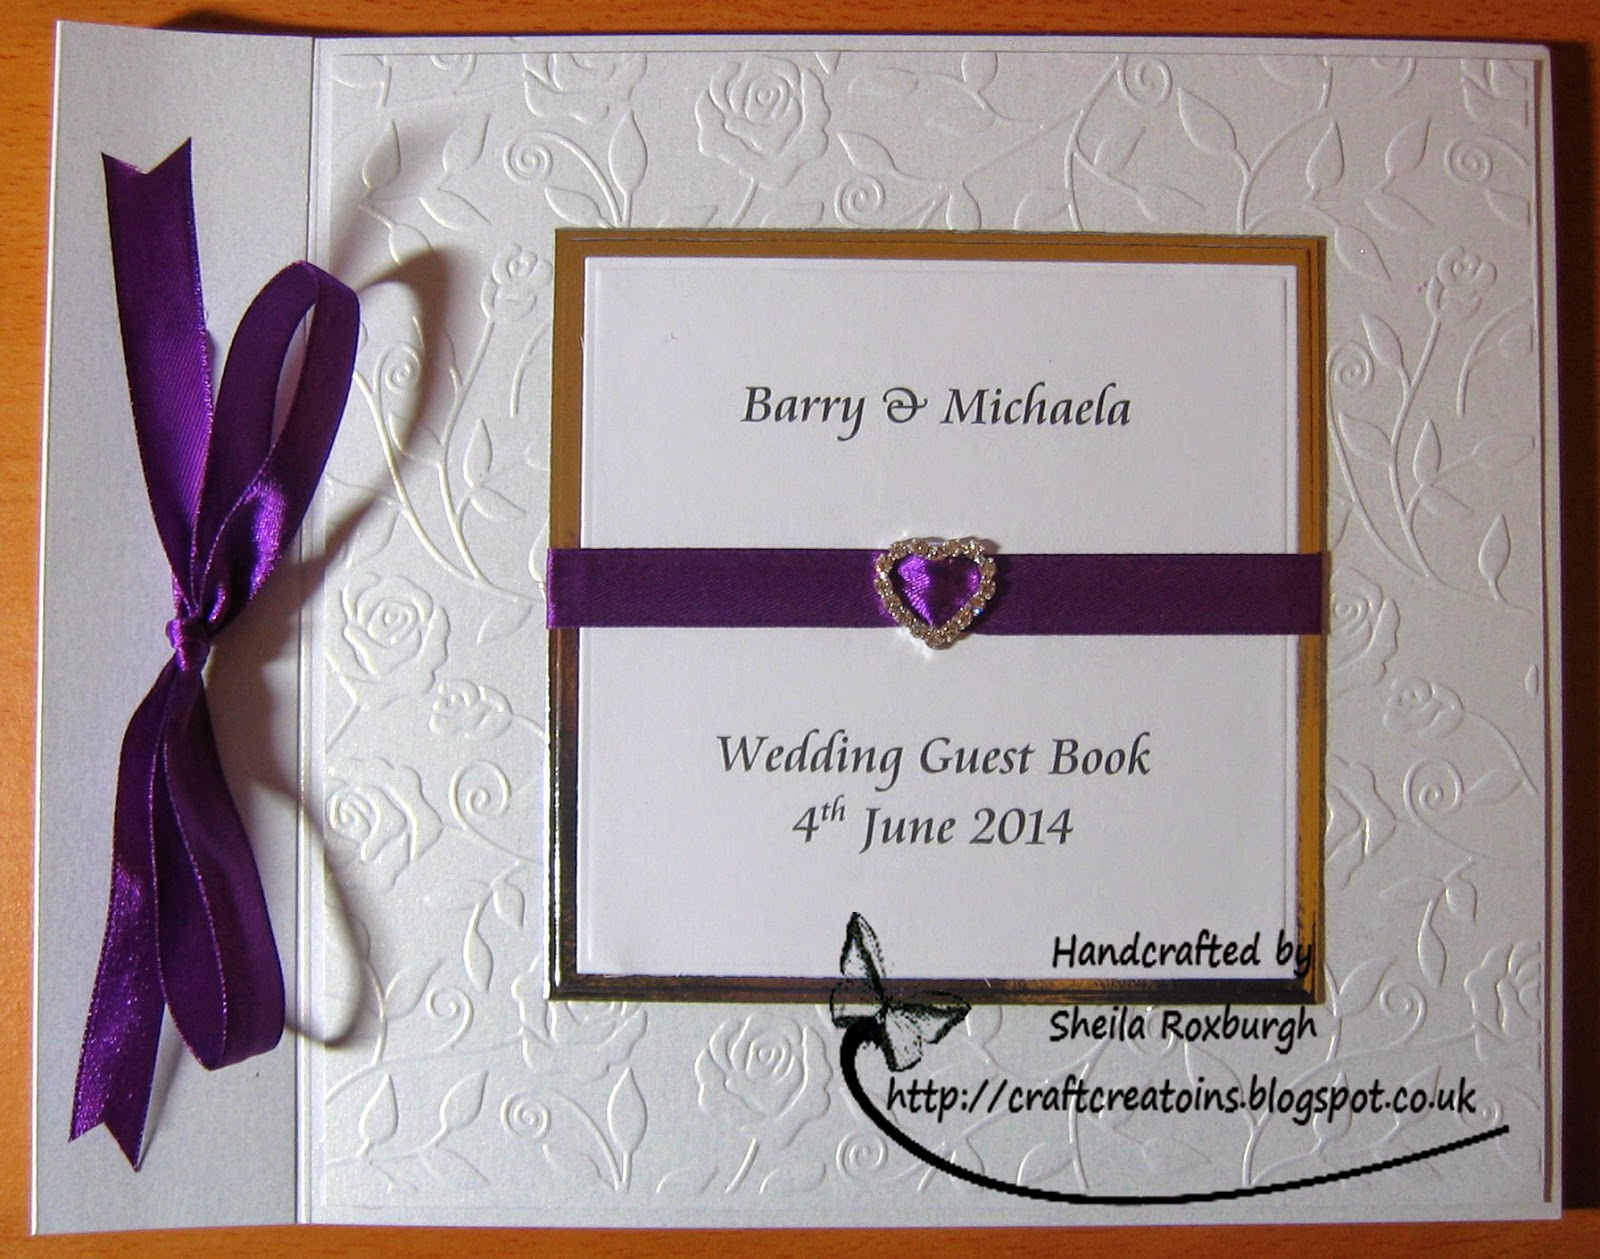 My Craft Creations Wedding Invitations